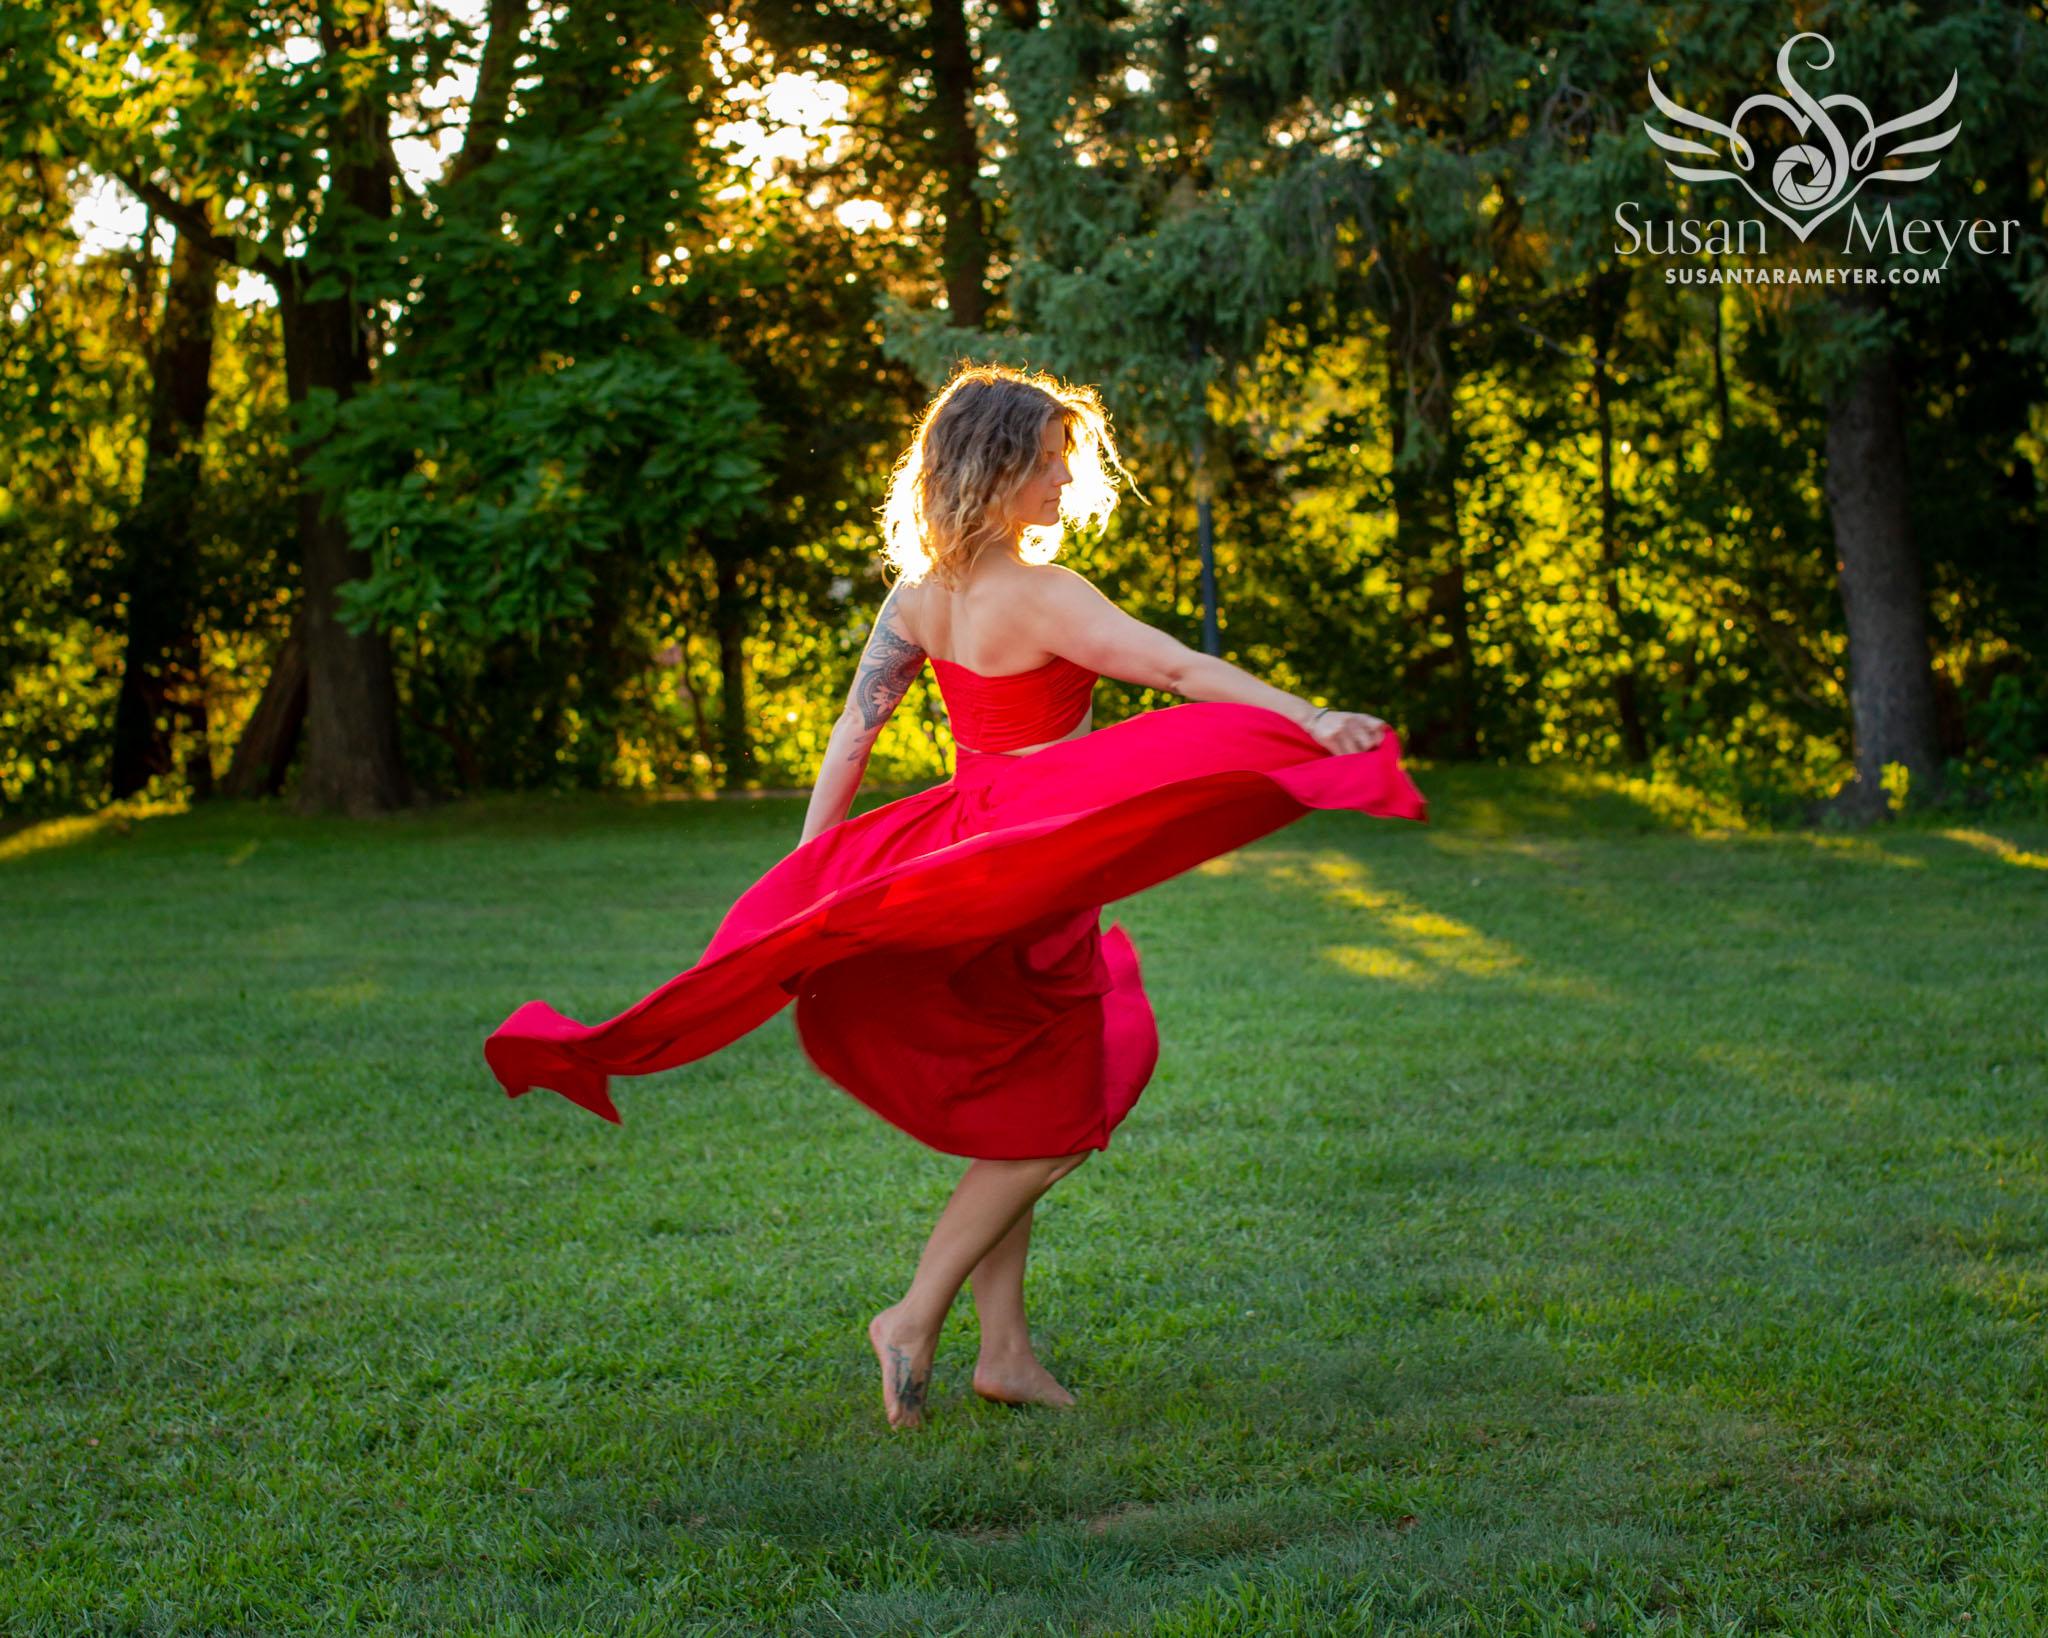 Red-Dress-Spinning-2